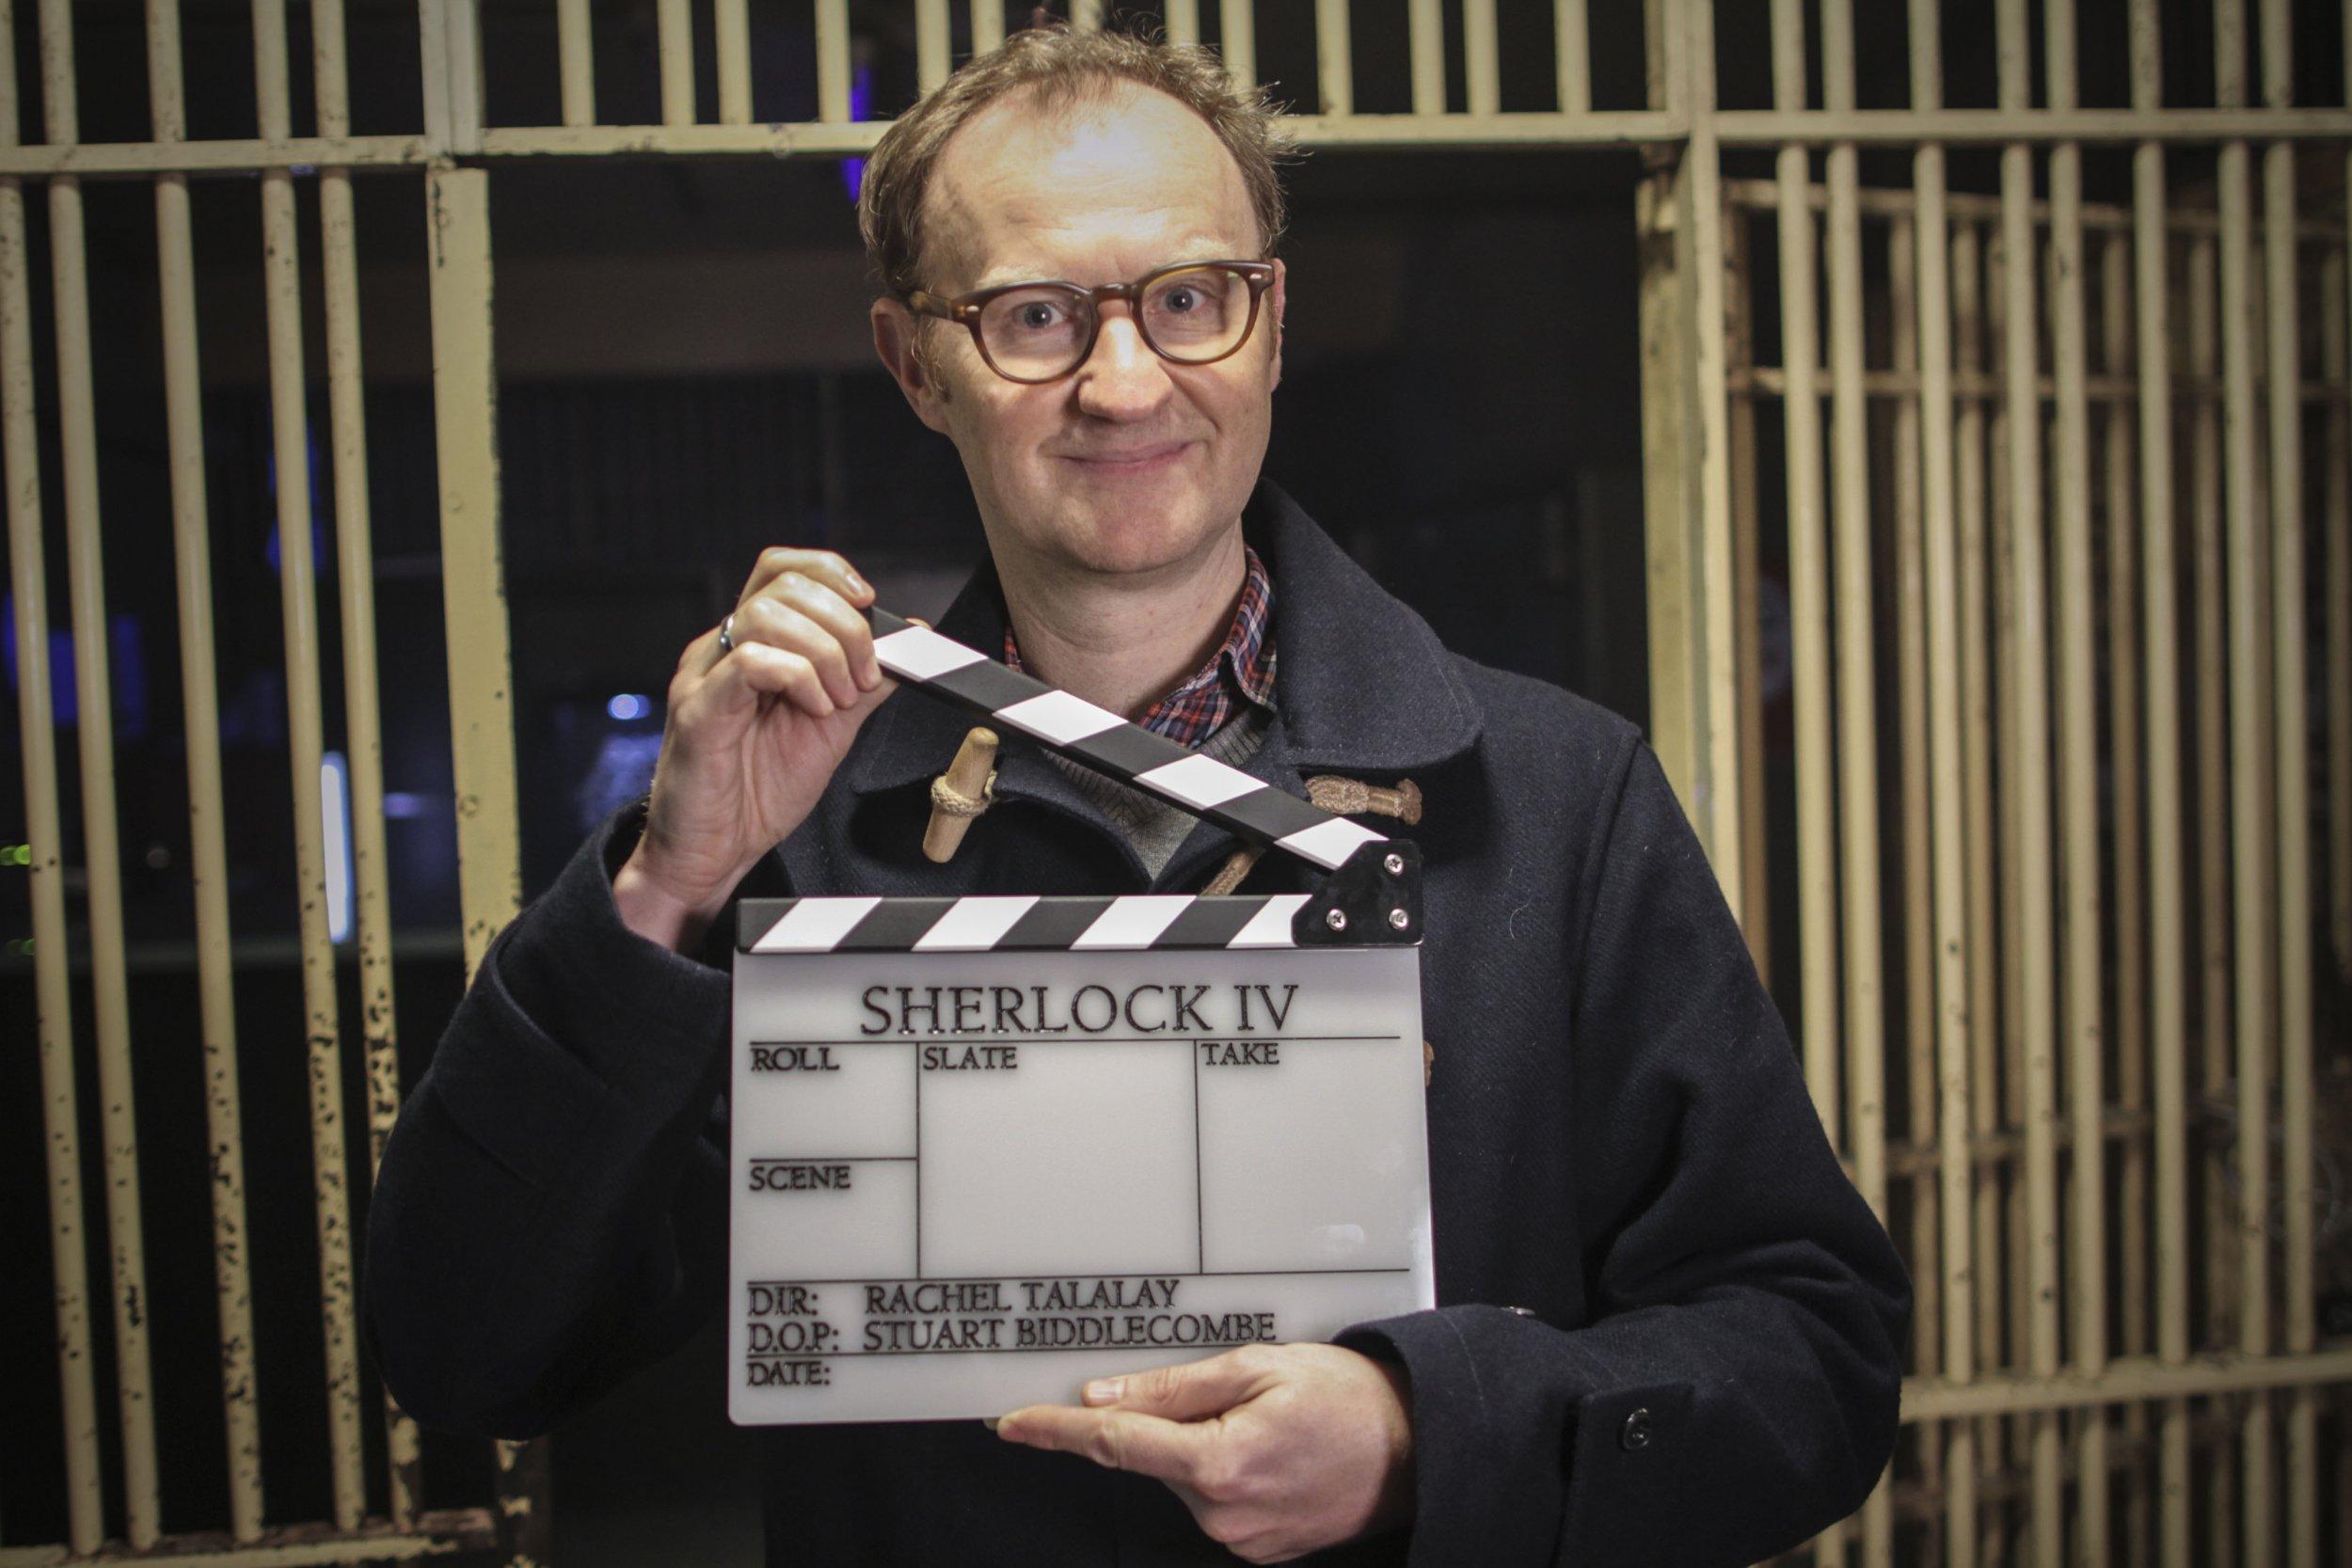 Sherlock season 4 begins production